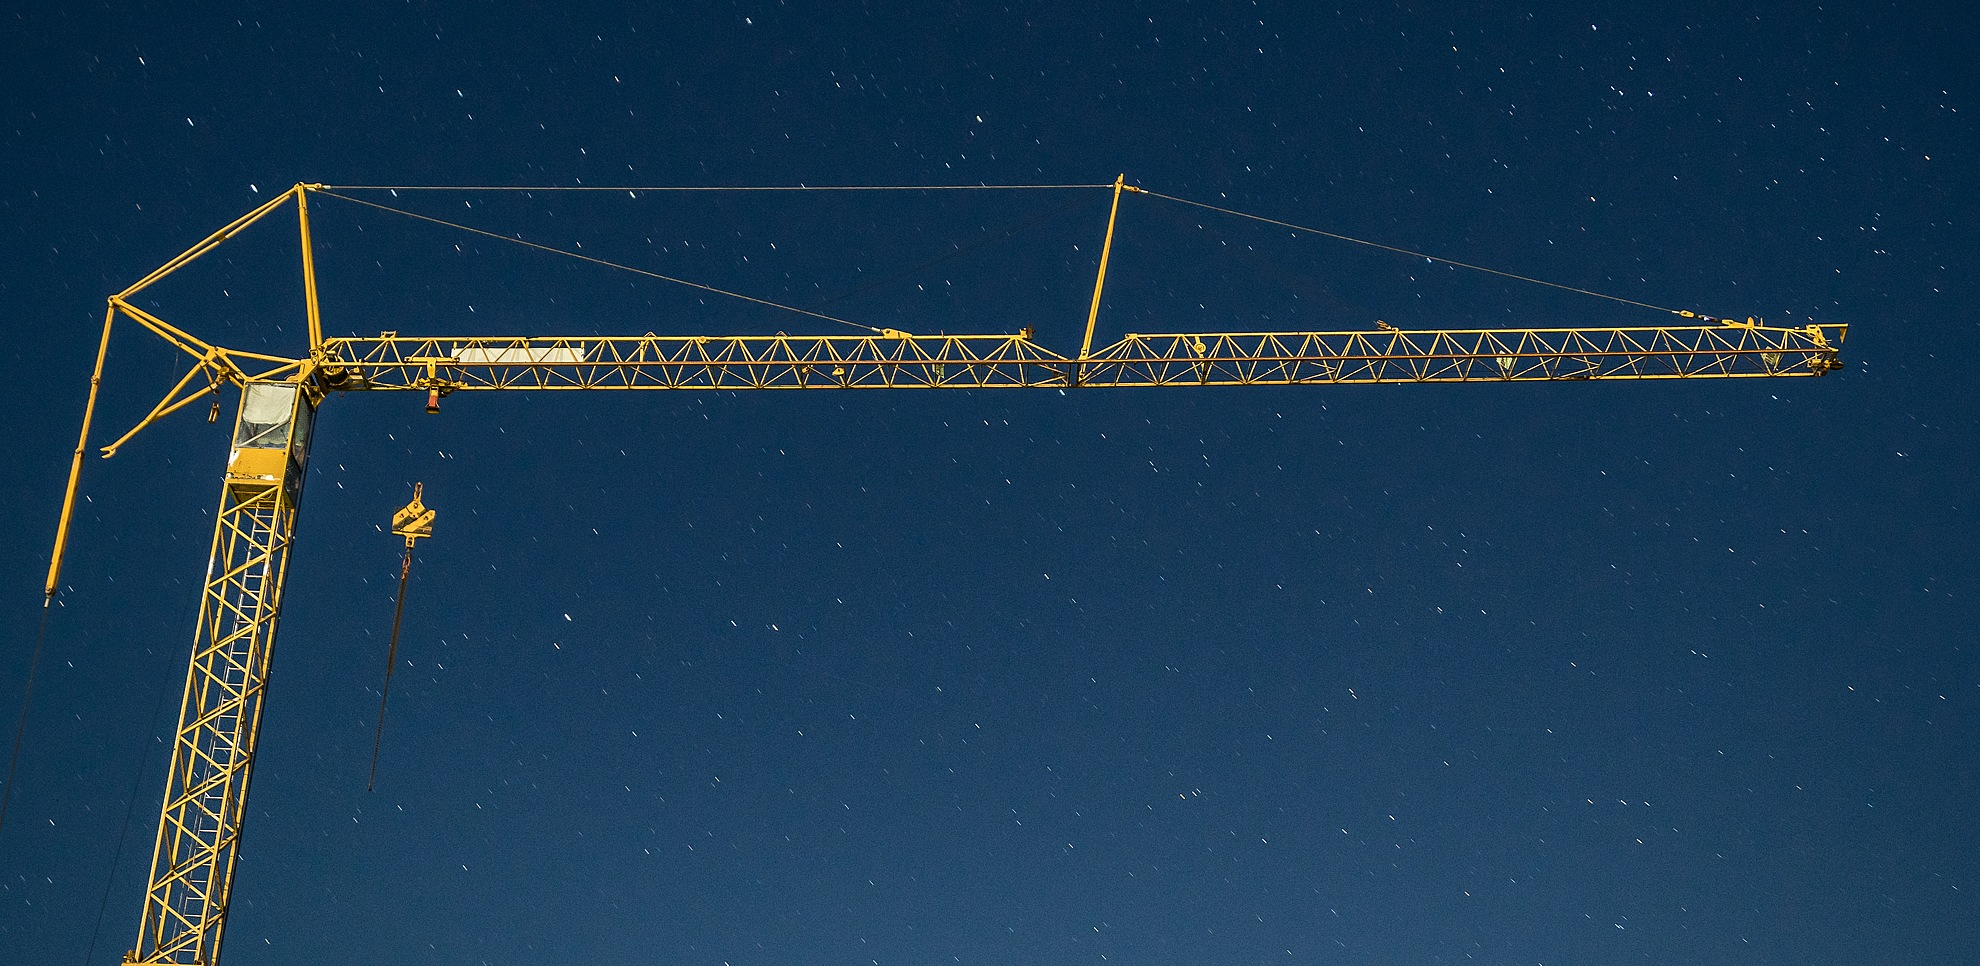 Crane at night by AK Photography